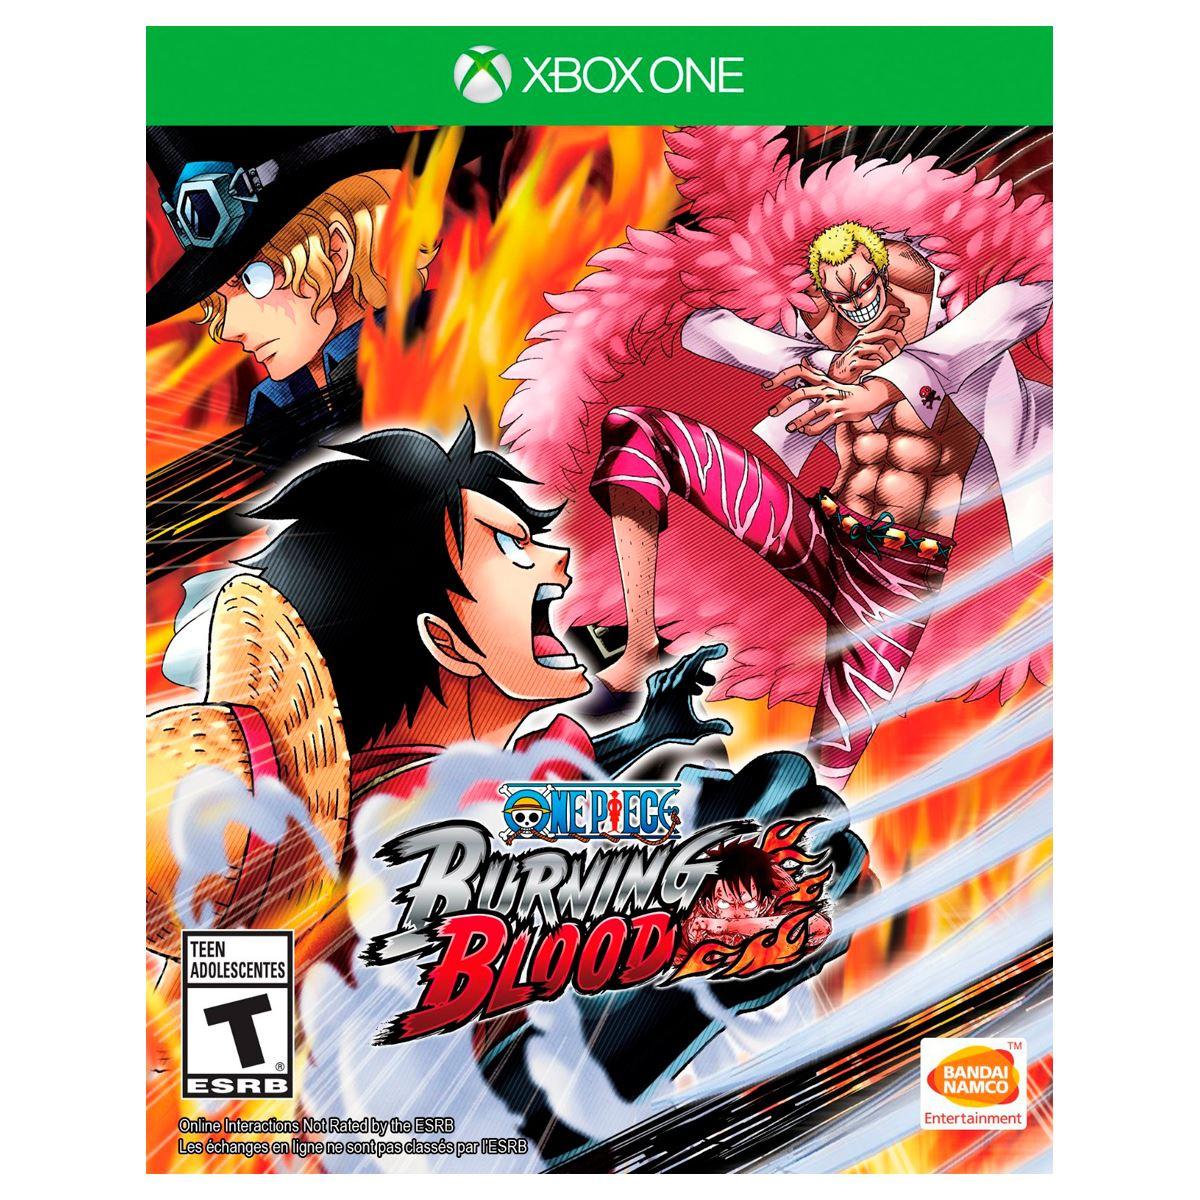 Claro Shop: Xbox One One Piece Burning Blood